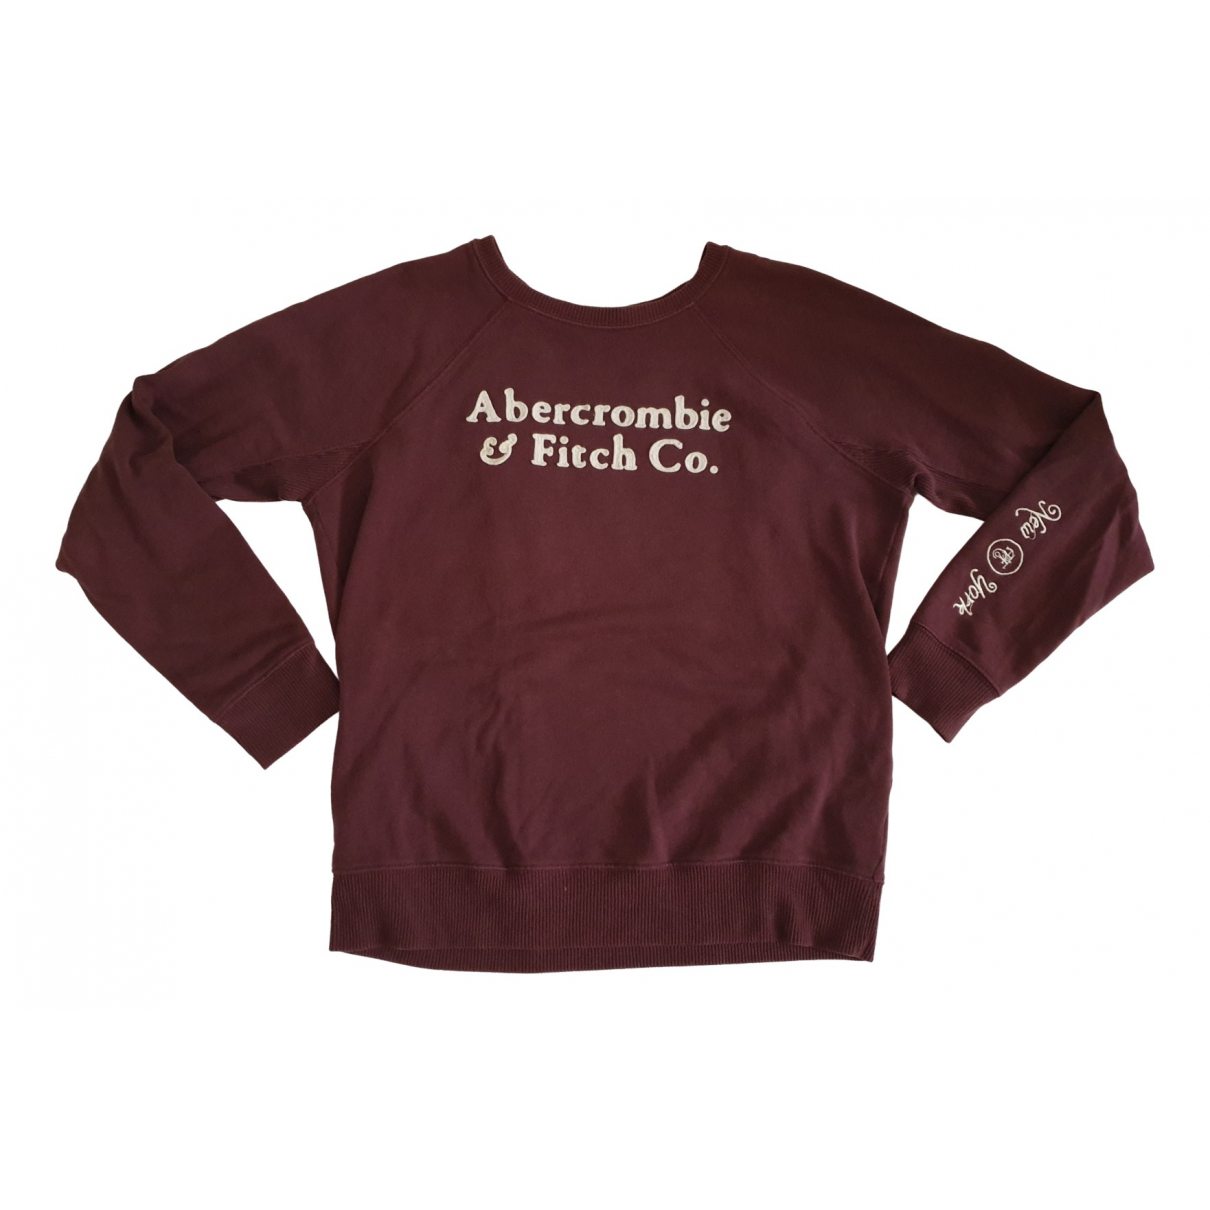 Abercrombie & Fitch N Burgundy Cotton Knitwear for Women M International